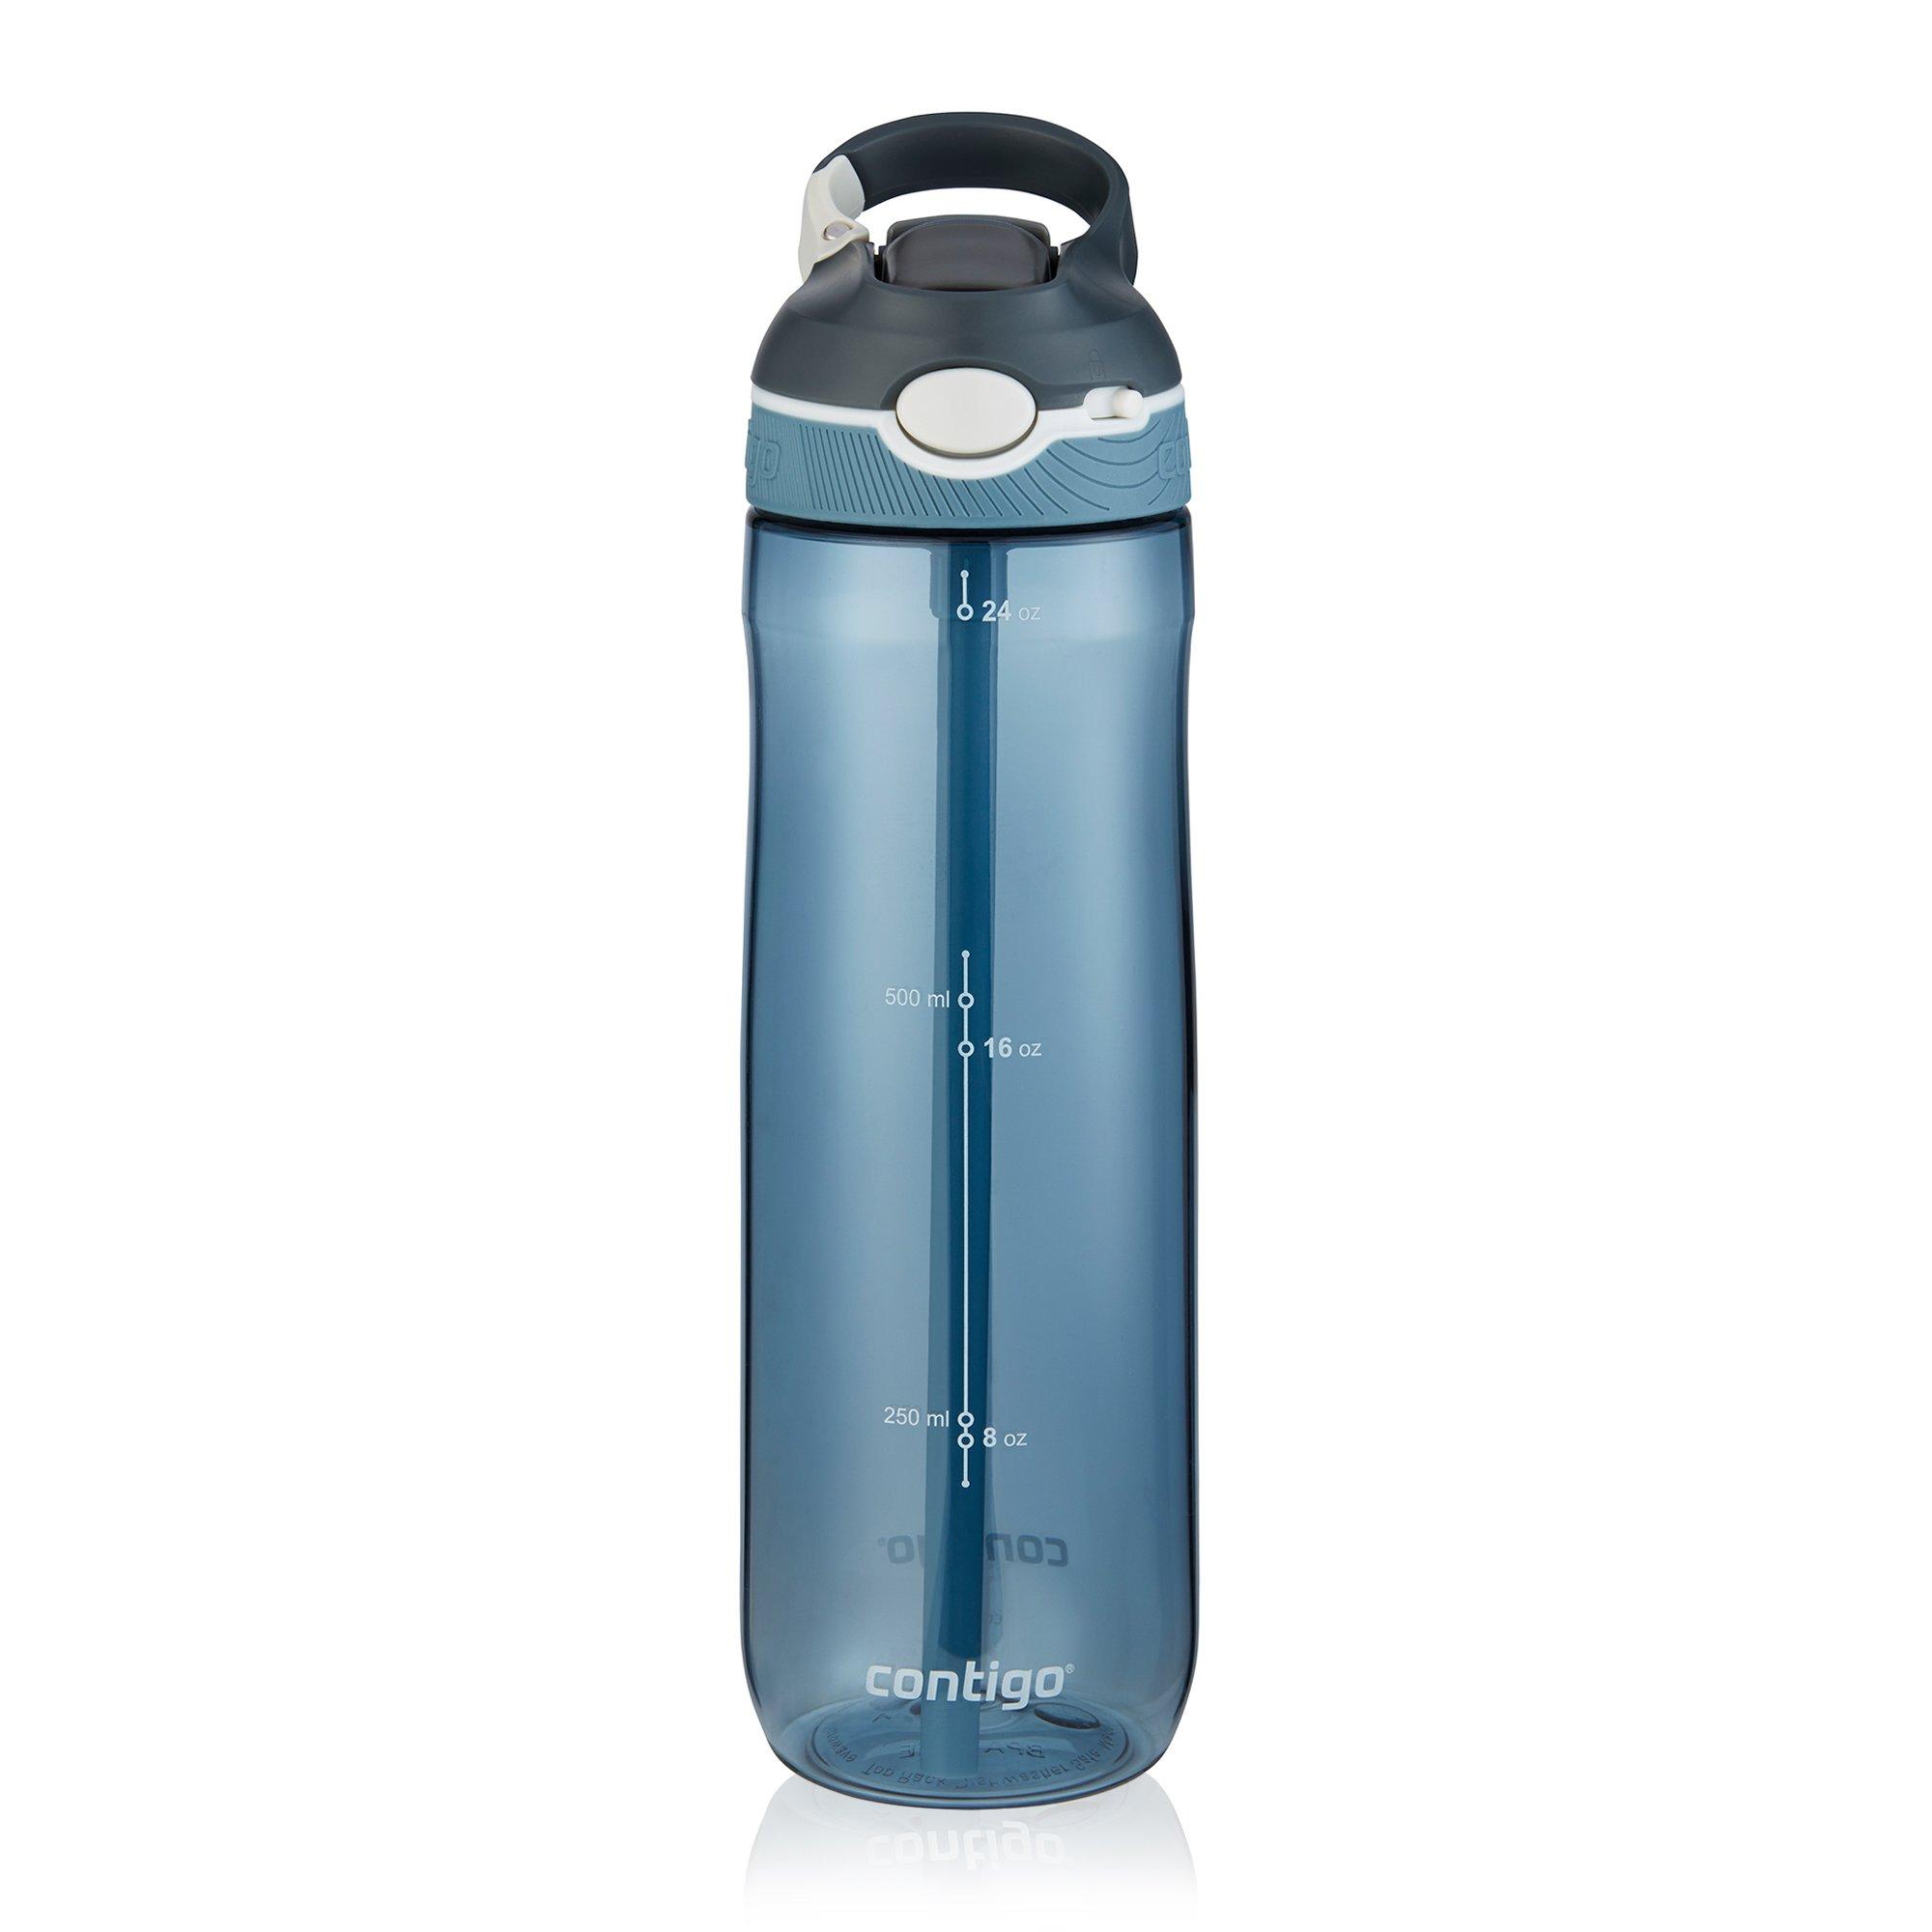 Contigo AUTOSPOUT Straw Ashland Water Bottle, 24 oz, Stormy Weather/Vibrant Lime/Monaco, 3-pack by Contigo (Image #7)